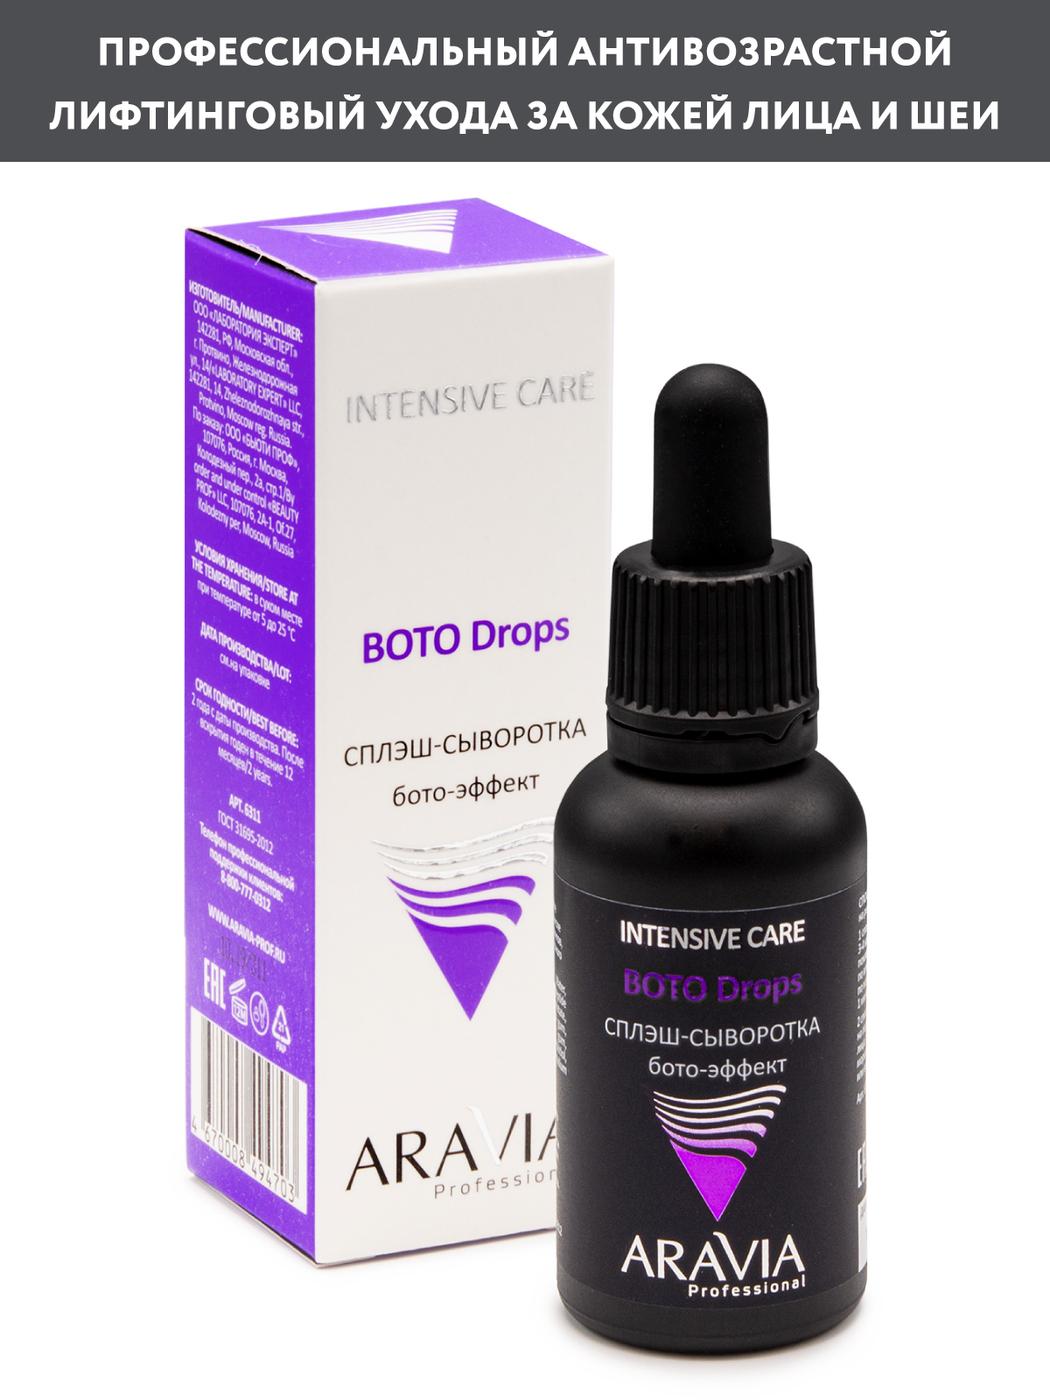 ARAVIA Professional Сплэш-сыворотка для лица бото-эффект Boto Drops, 30 мл